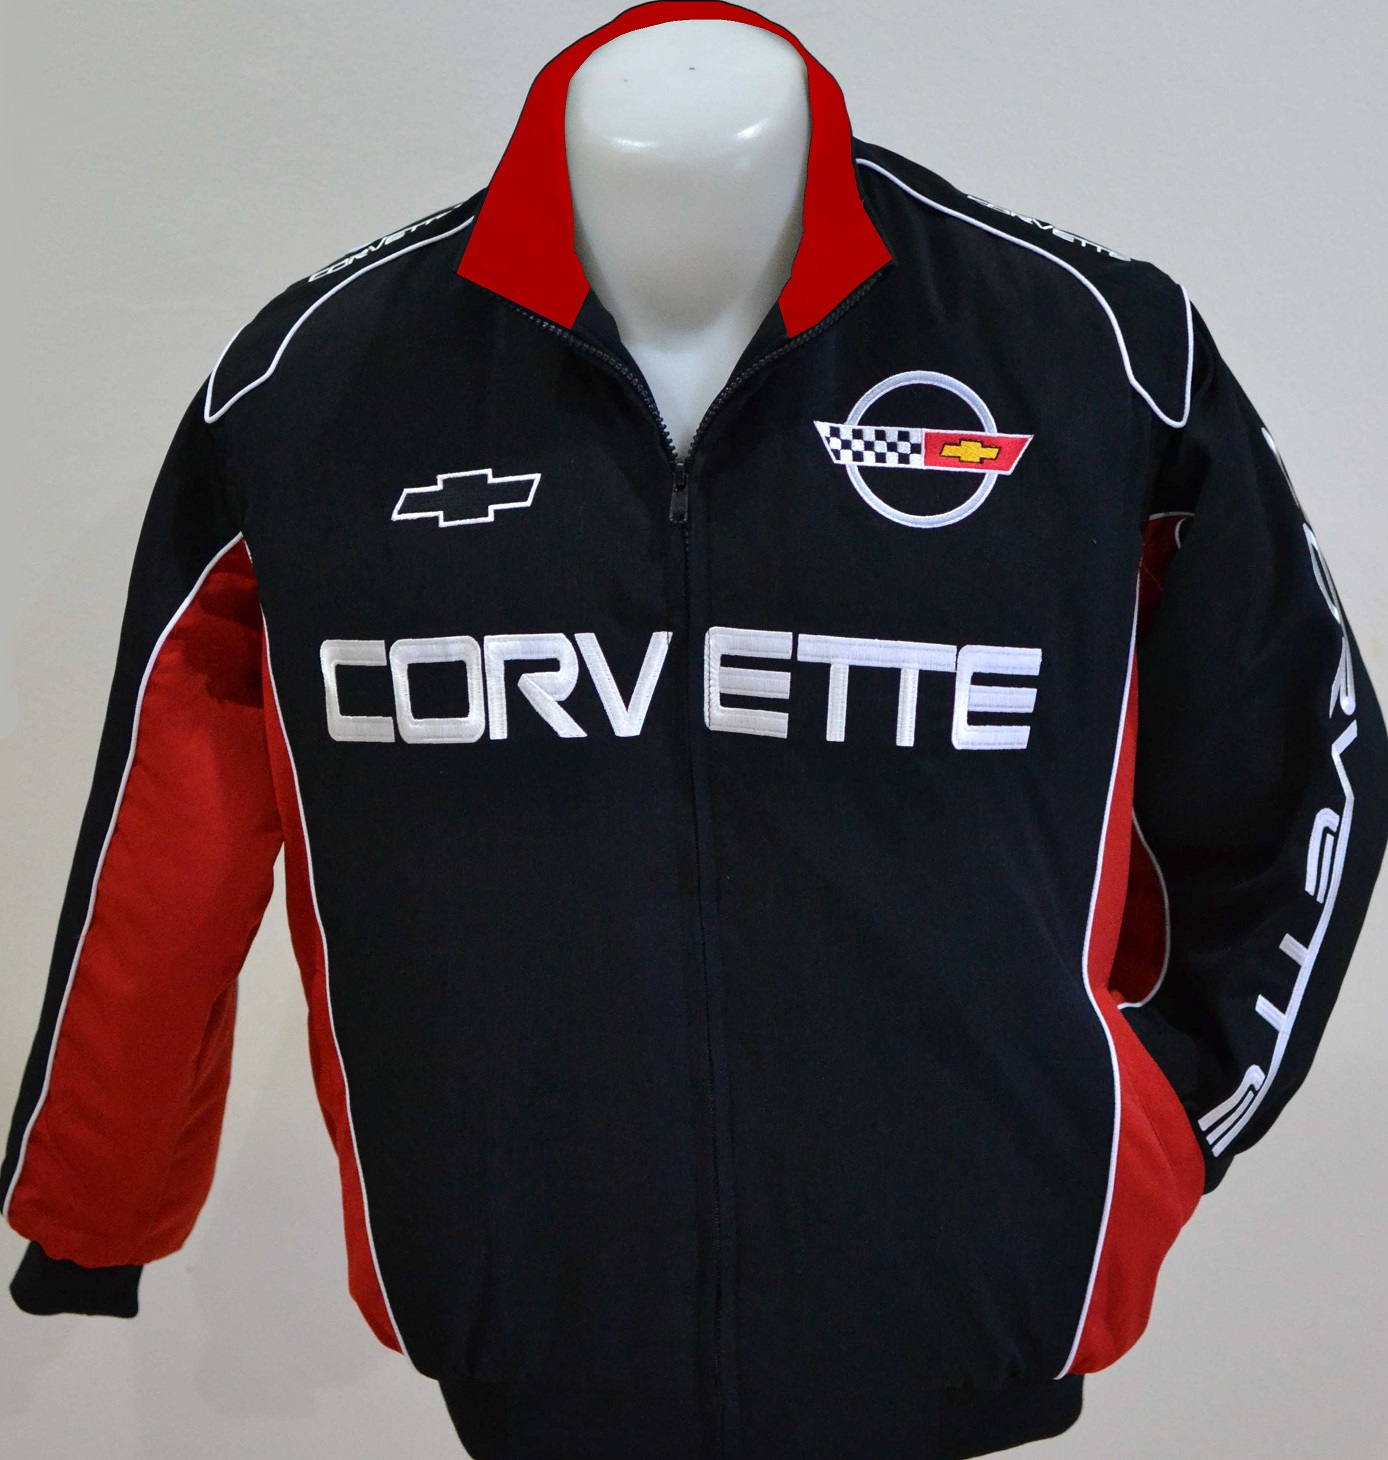 new style 14fdb 9e6ca Corvette-C4-Racing - Jacket // Corvette-C4-Racing - Jacke sold by Pro  Fashion